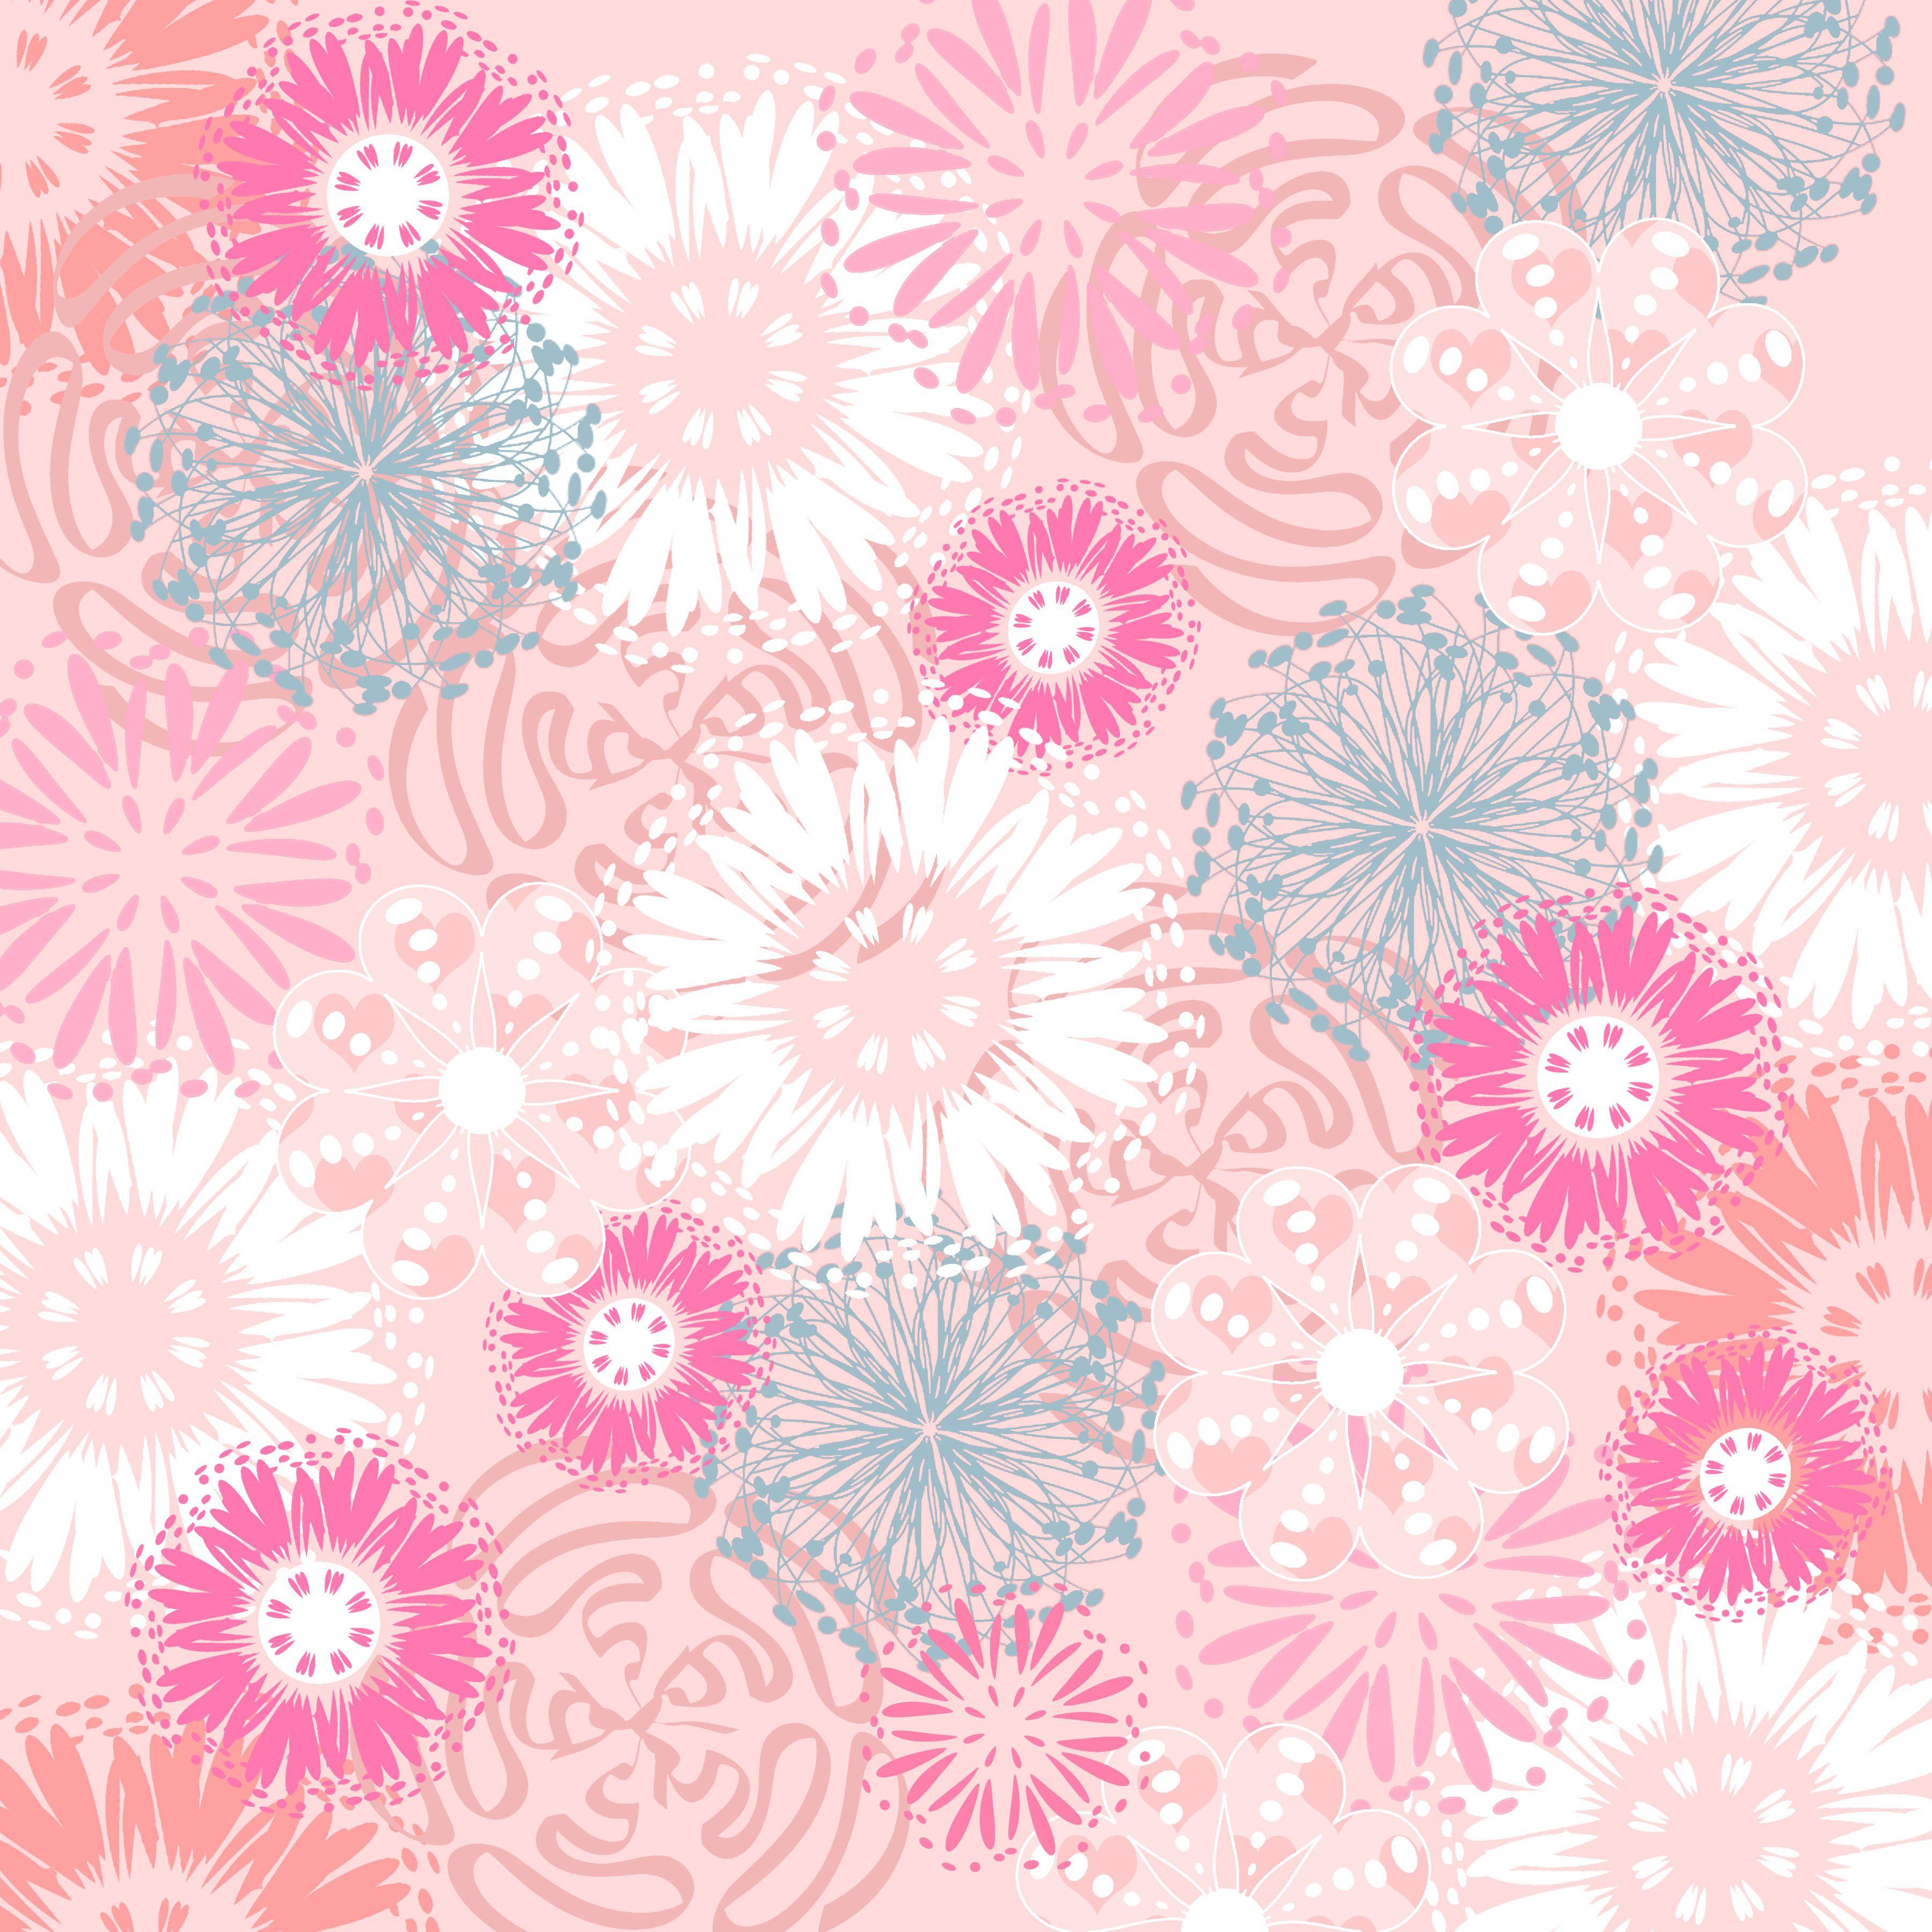 Free+Printable+Scrapbook+Paper | Scrapbook Paper | Pinterest - Free Printable Backgrounds